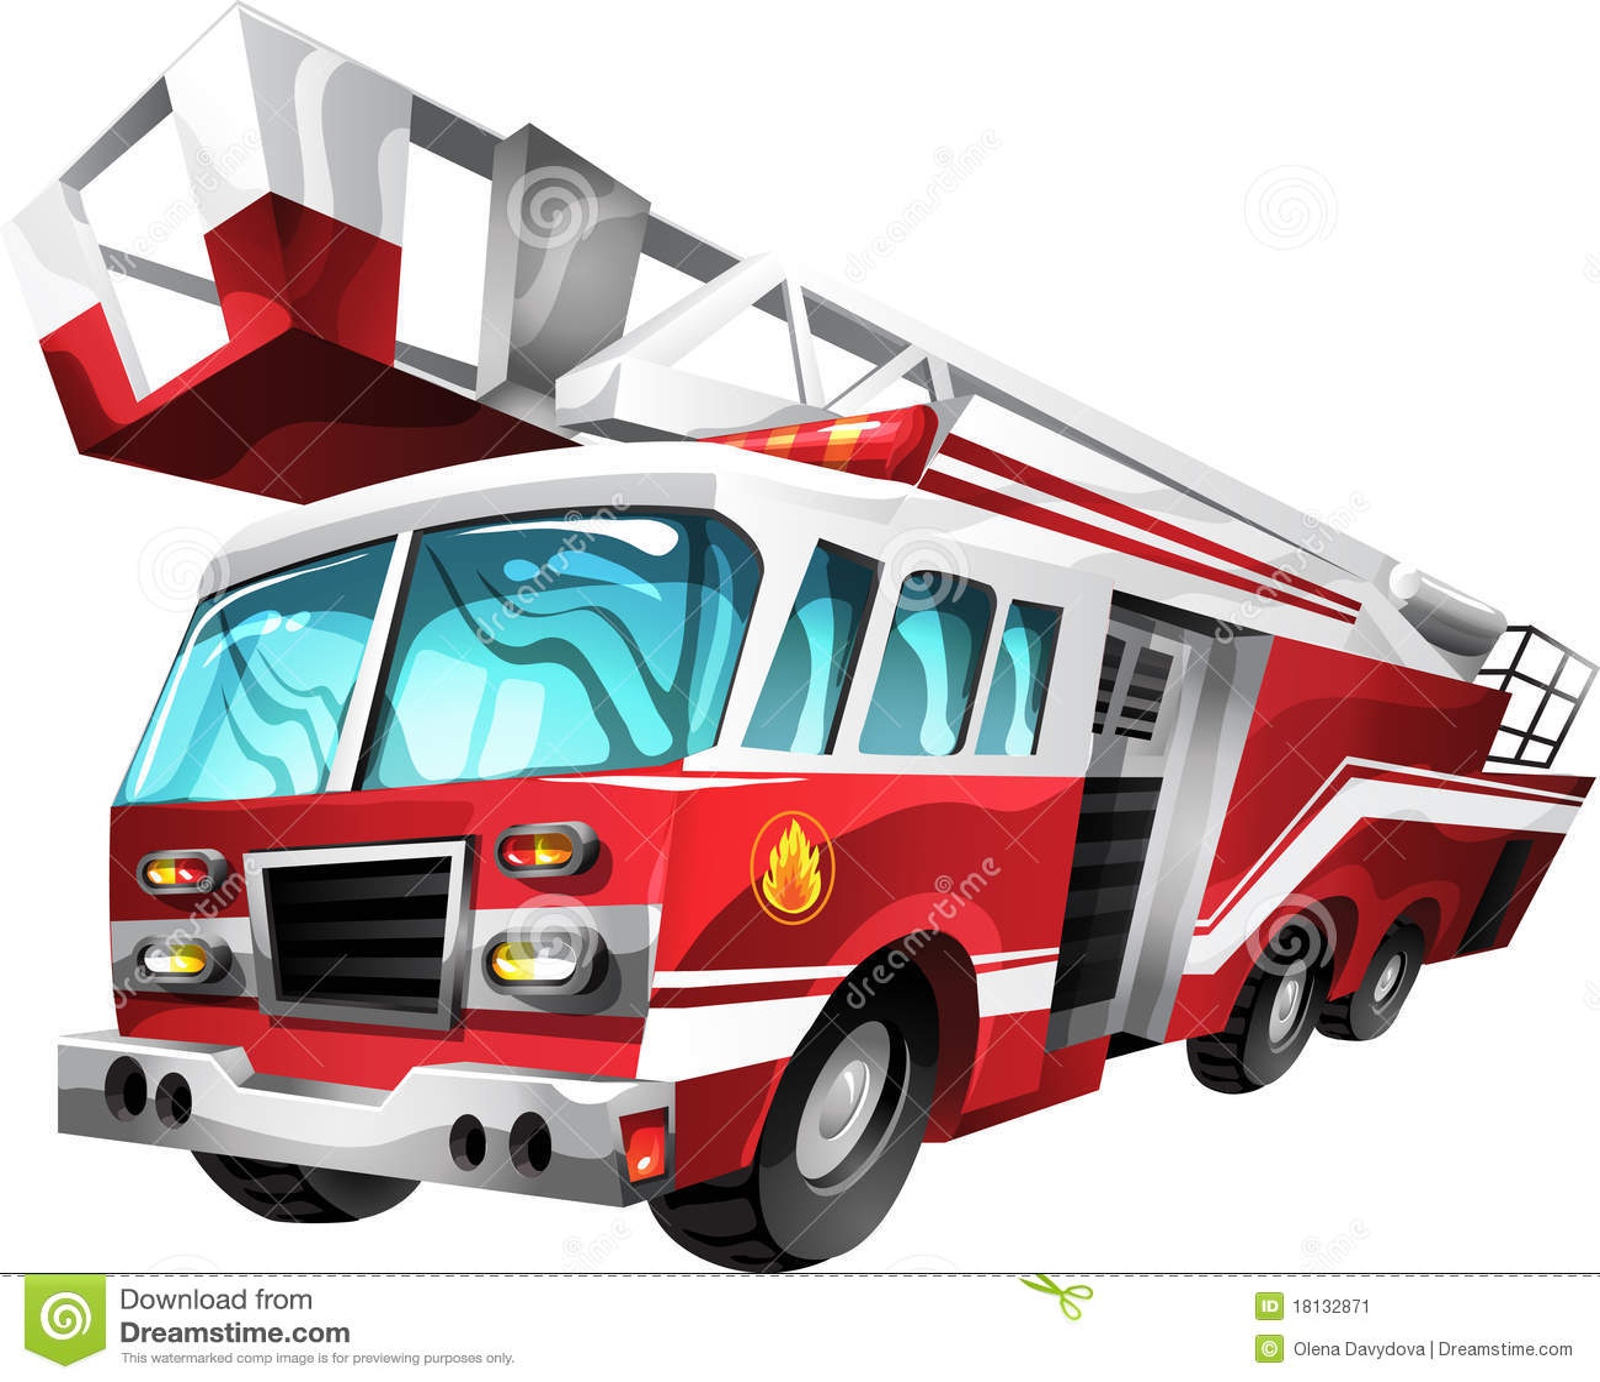 Camion de pompiers de dessin anim image stock image - Dessiner un camion de pompier ...